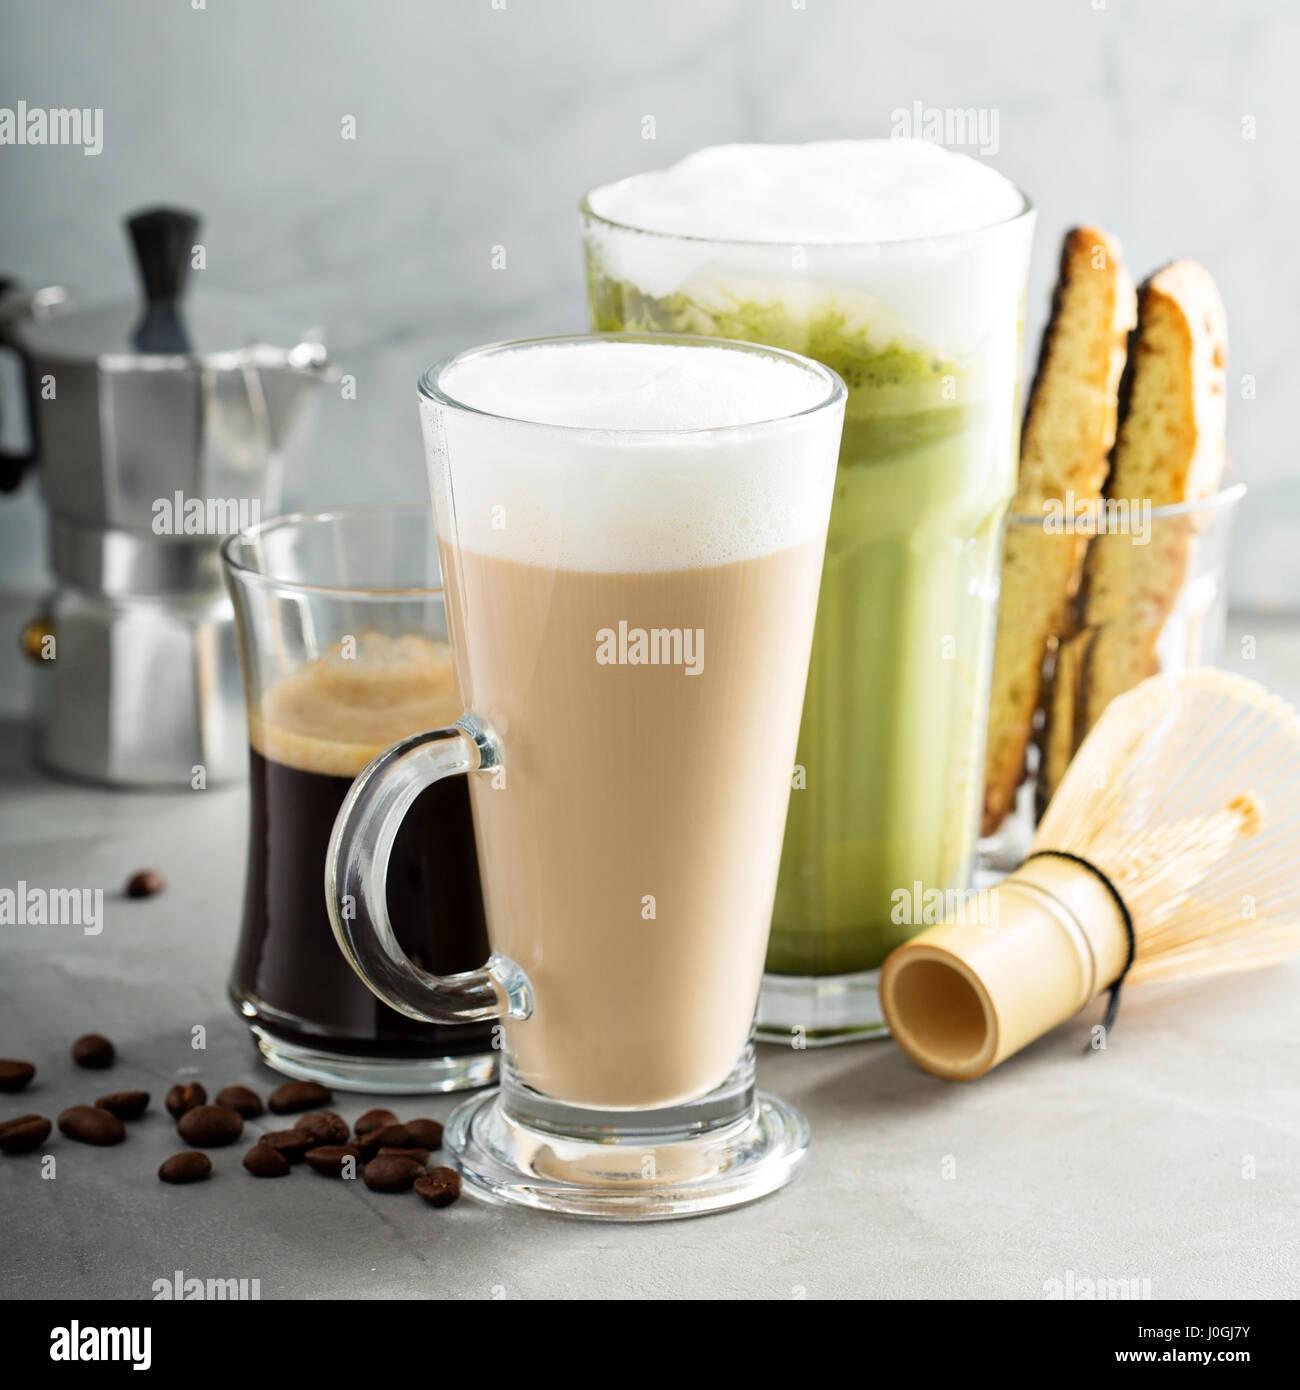 Espresso, regular coffee and matcha latte - Stock Image